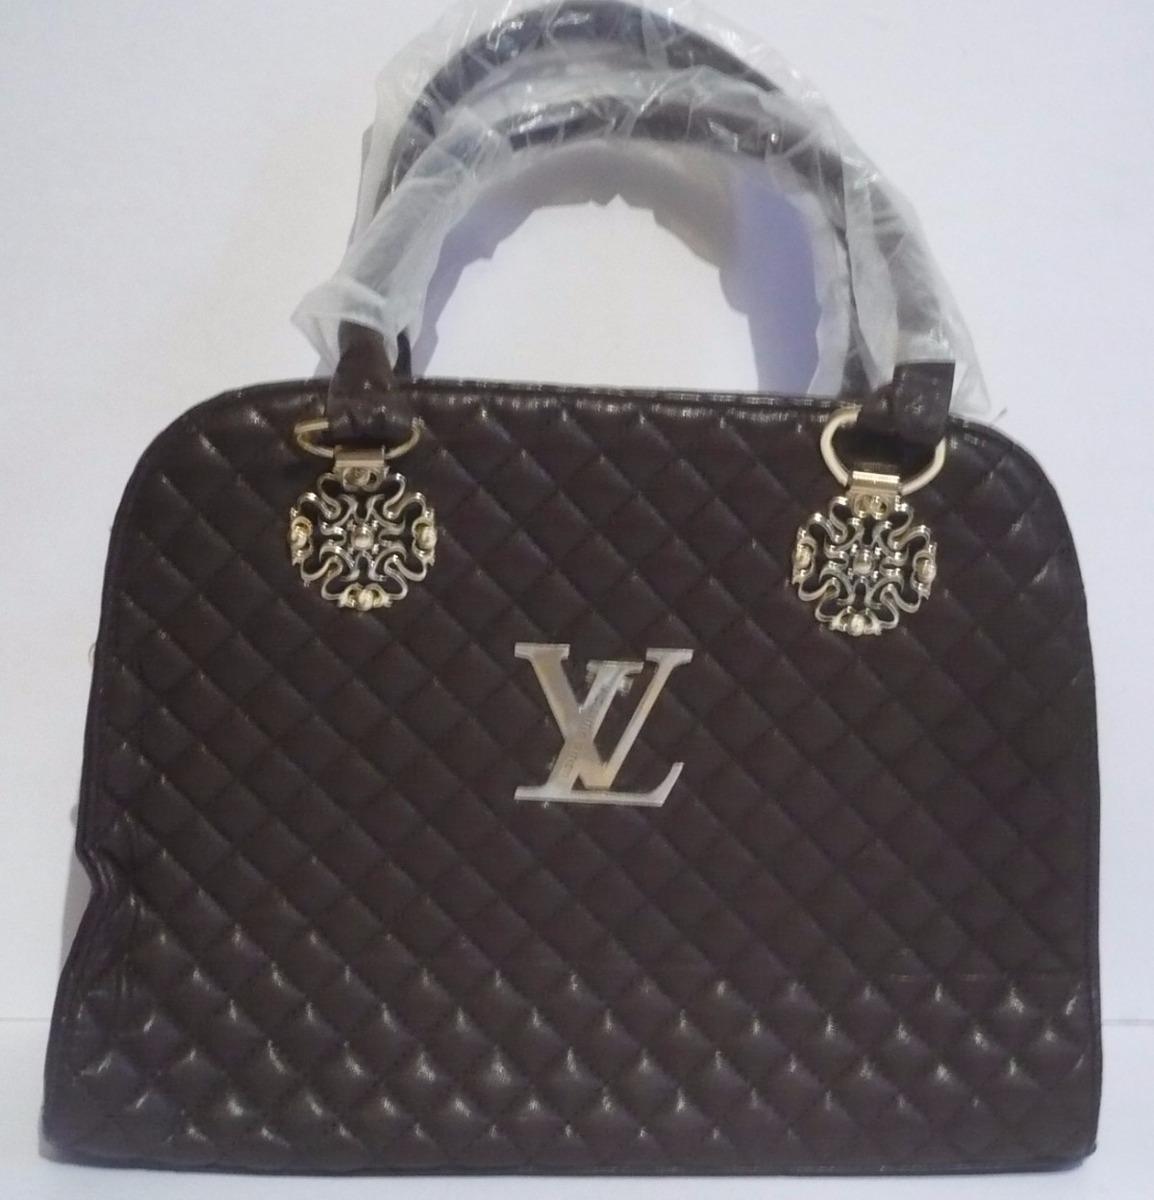 7b3d19b83 ... para dama - elegante bolsa d moda logotipo l v. Cargando zoom.